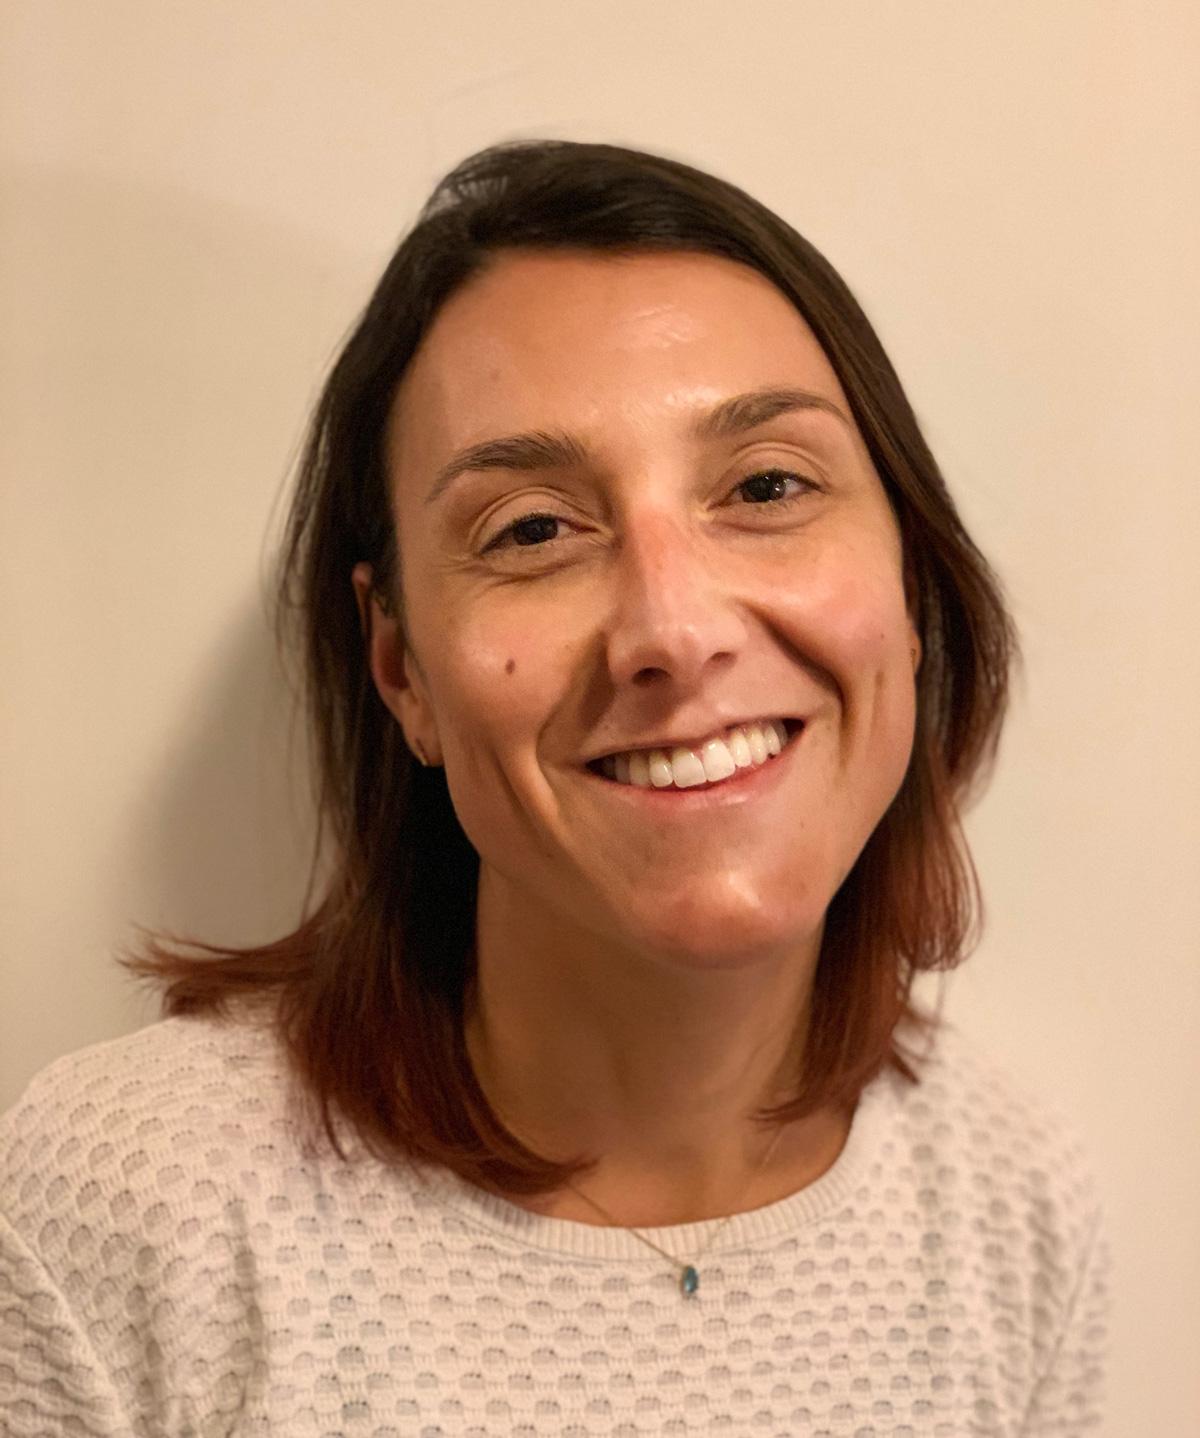 ManonMoulis-Profile-Image-Cropped.jpg